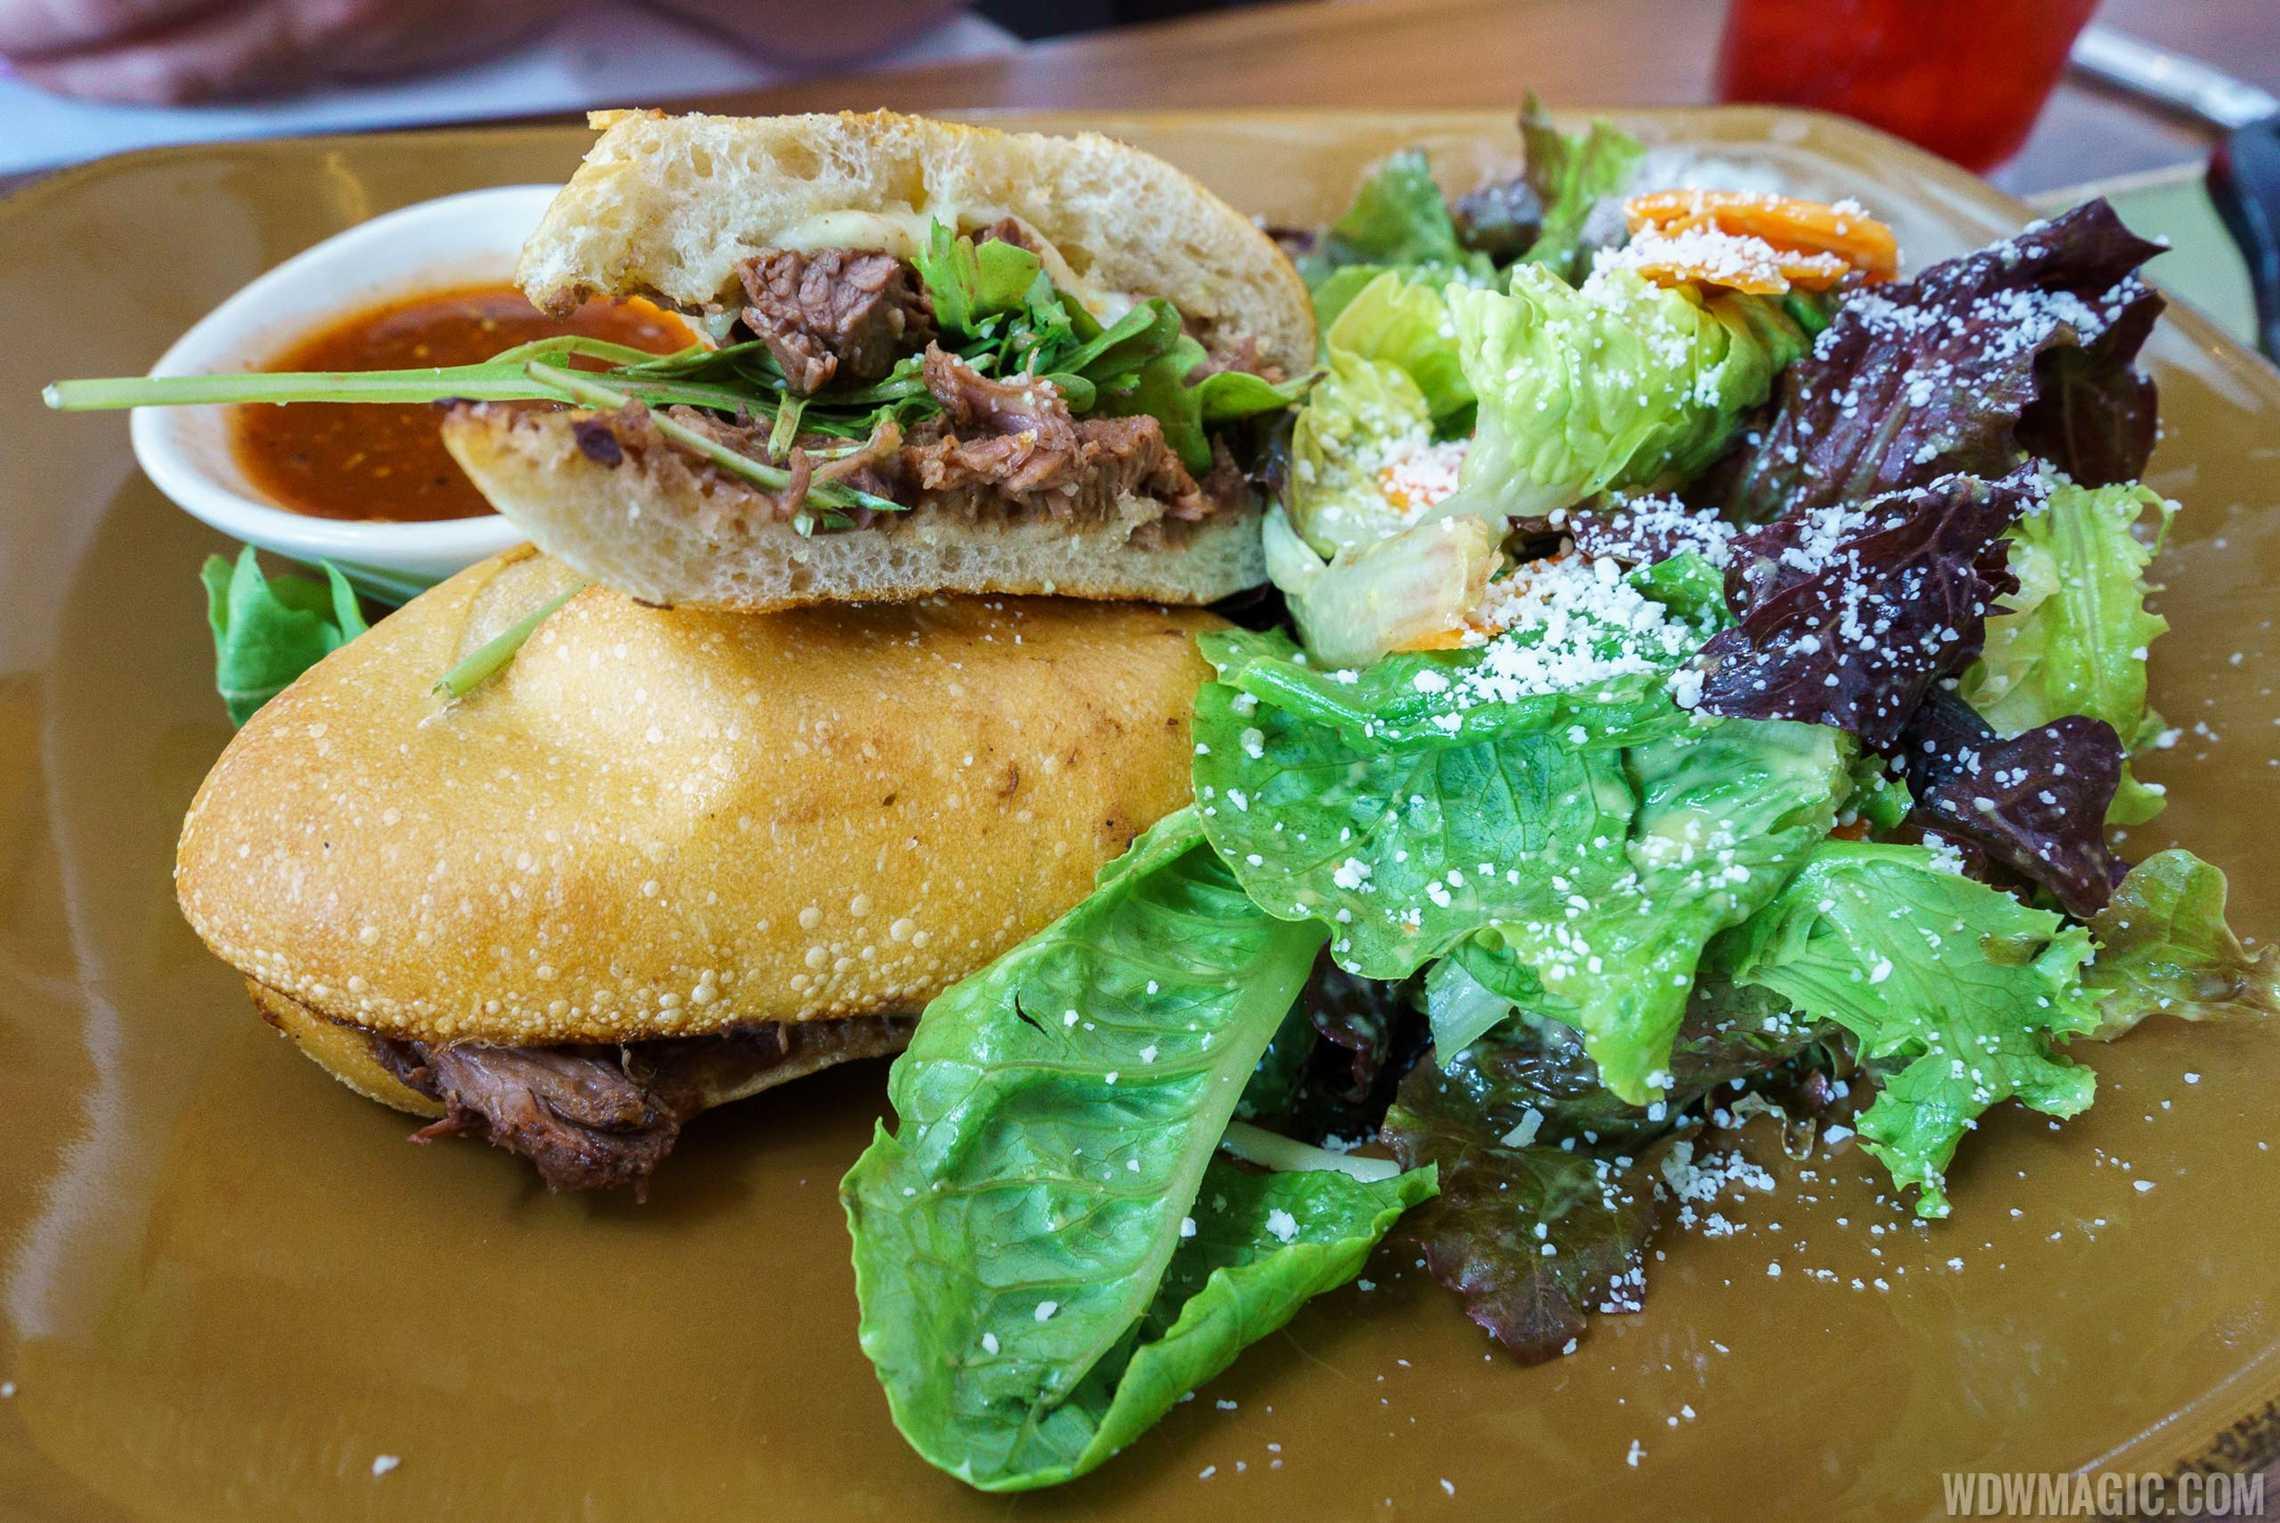 Frontera Cocina - Pepito Torta